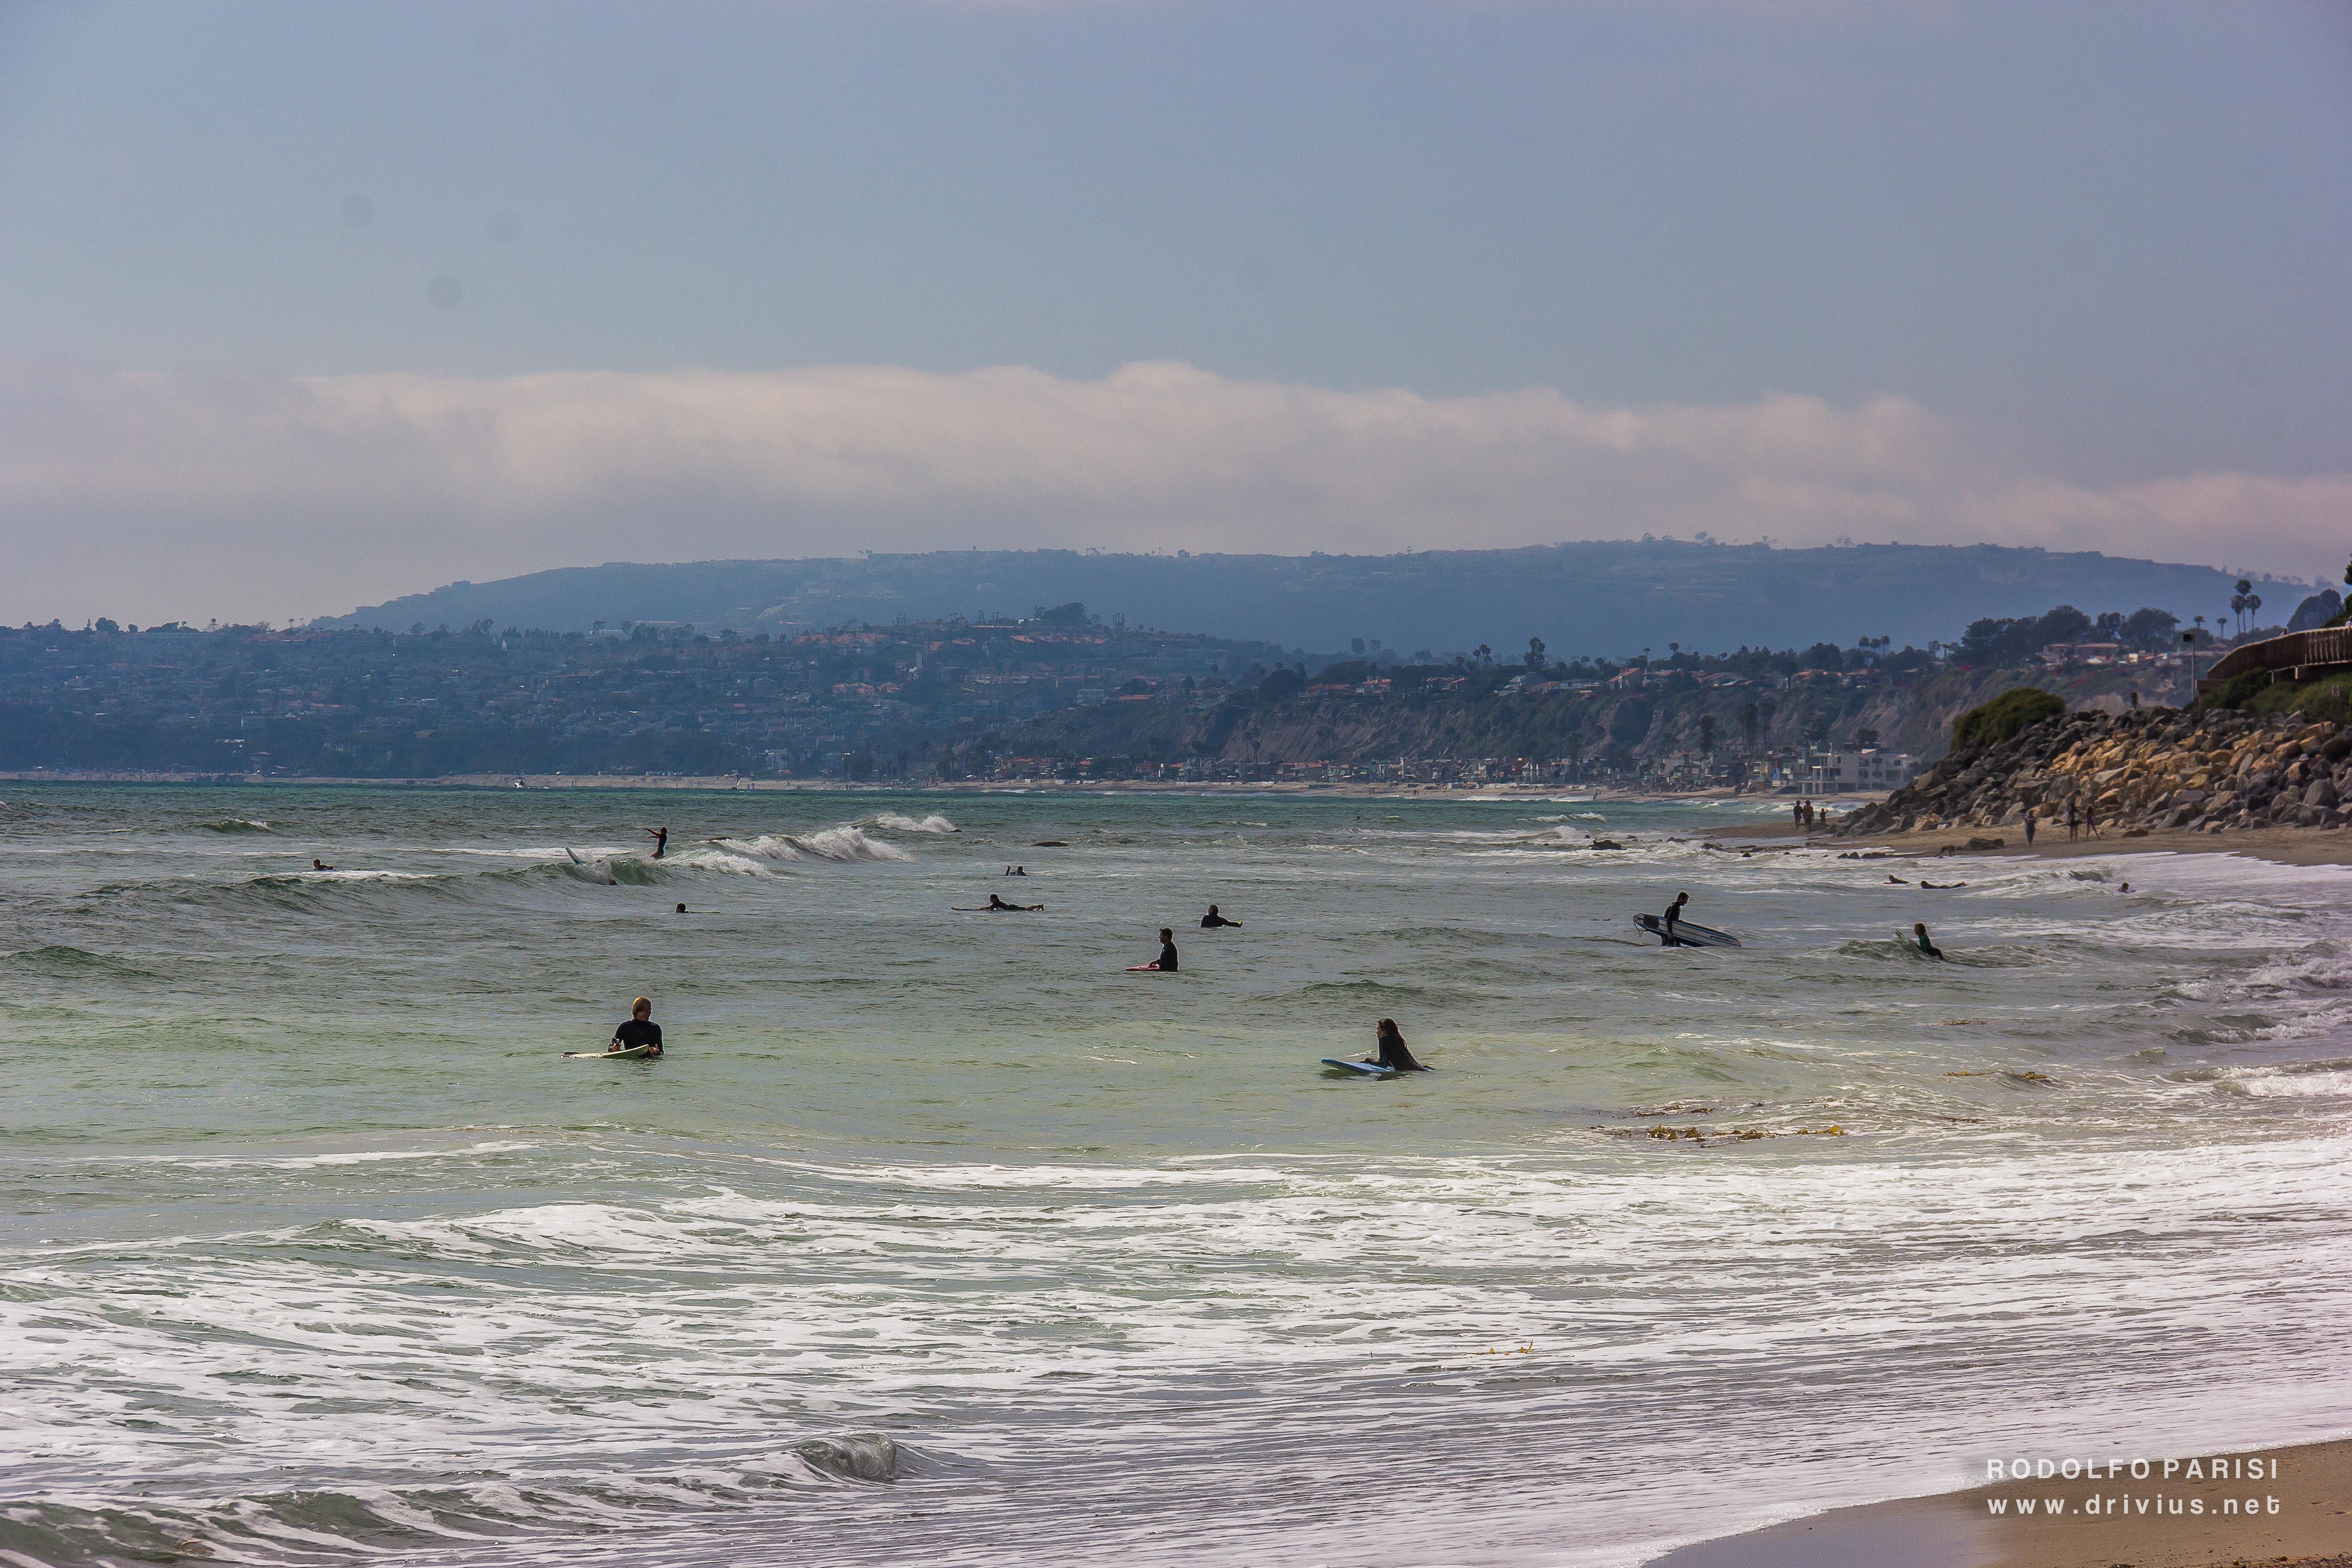 San Clemente, CA